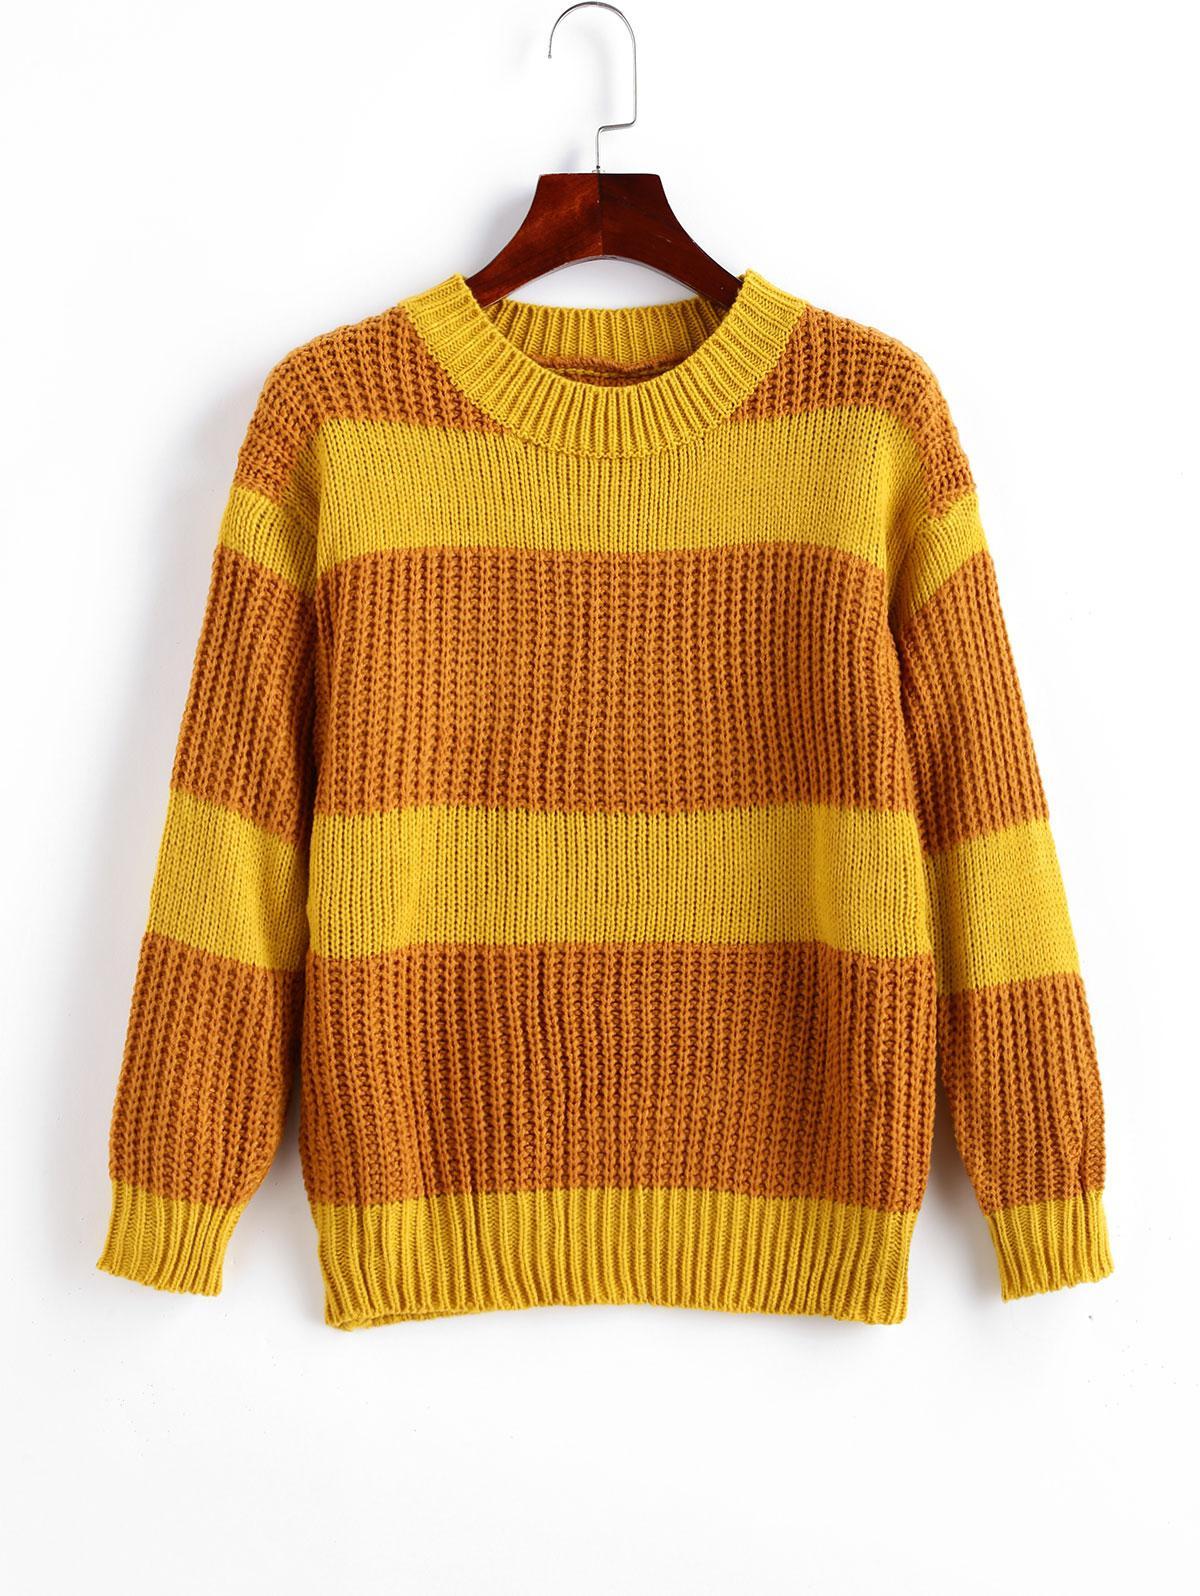 Crew Neck Colorblock Stripes Jumper Sweater